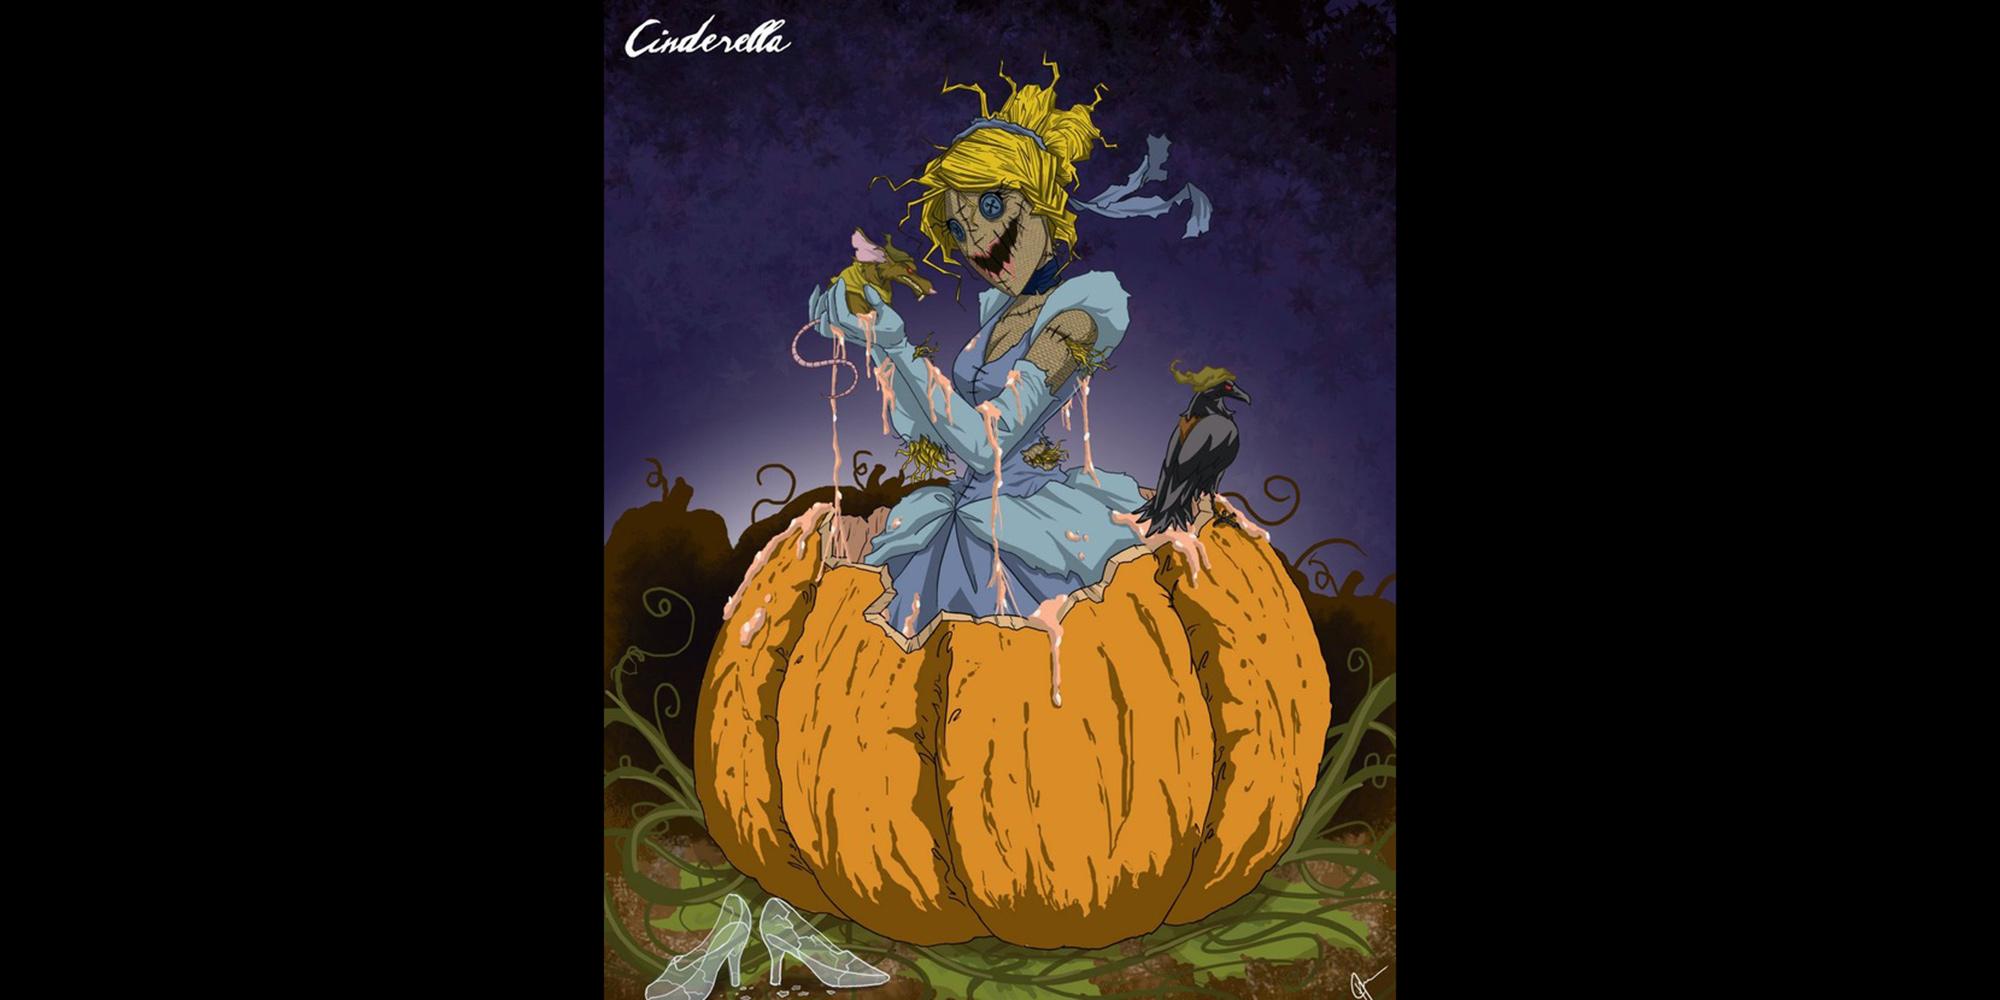 Twisted Princess Cinderella Disturbing Disney Fan Art